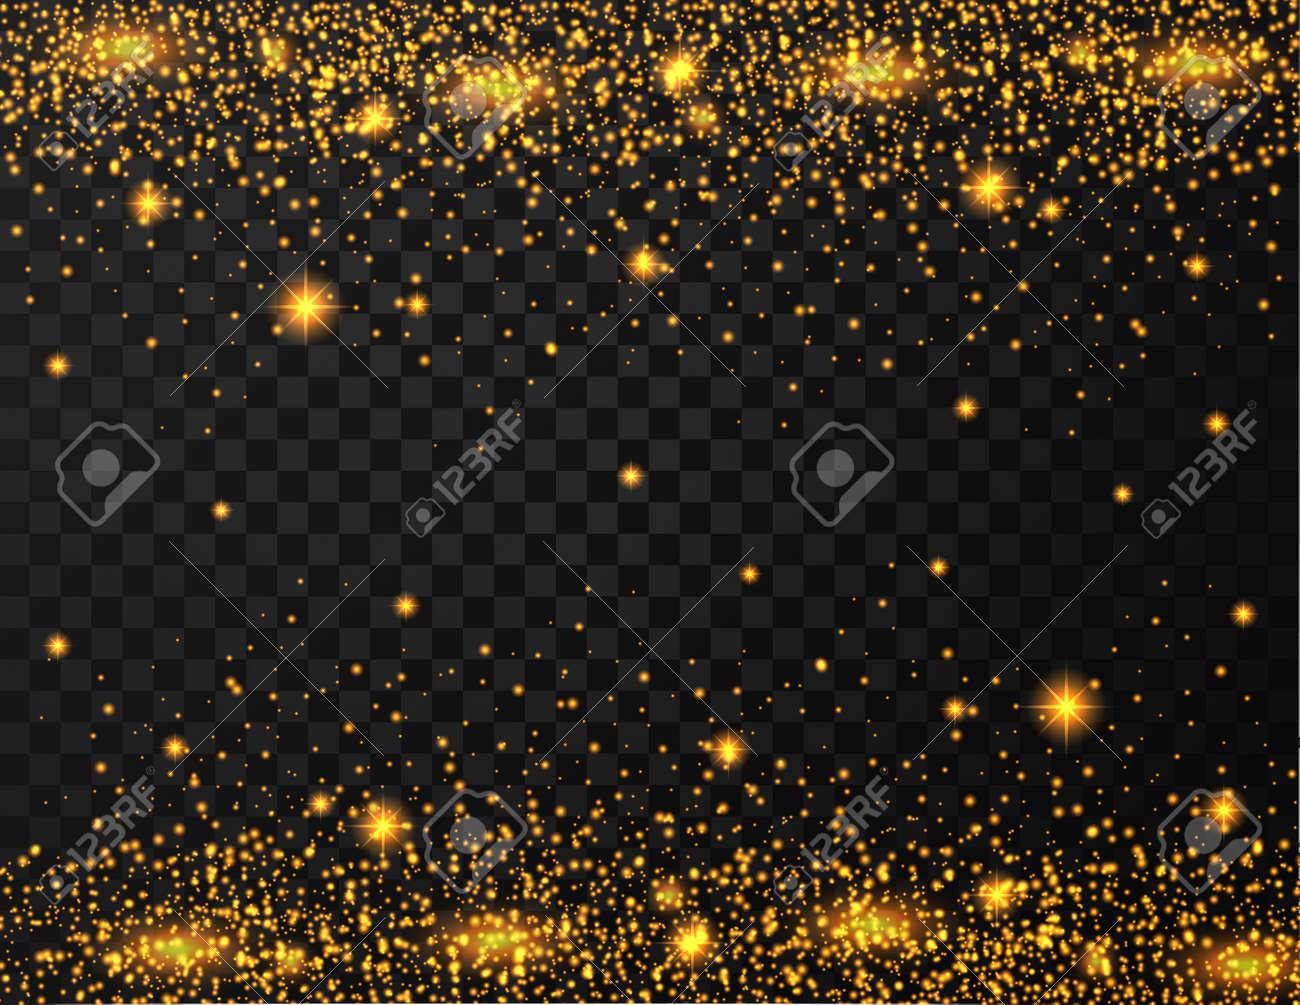 Gold glitter texture on transparent background - 168266710